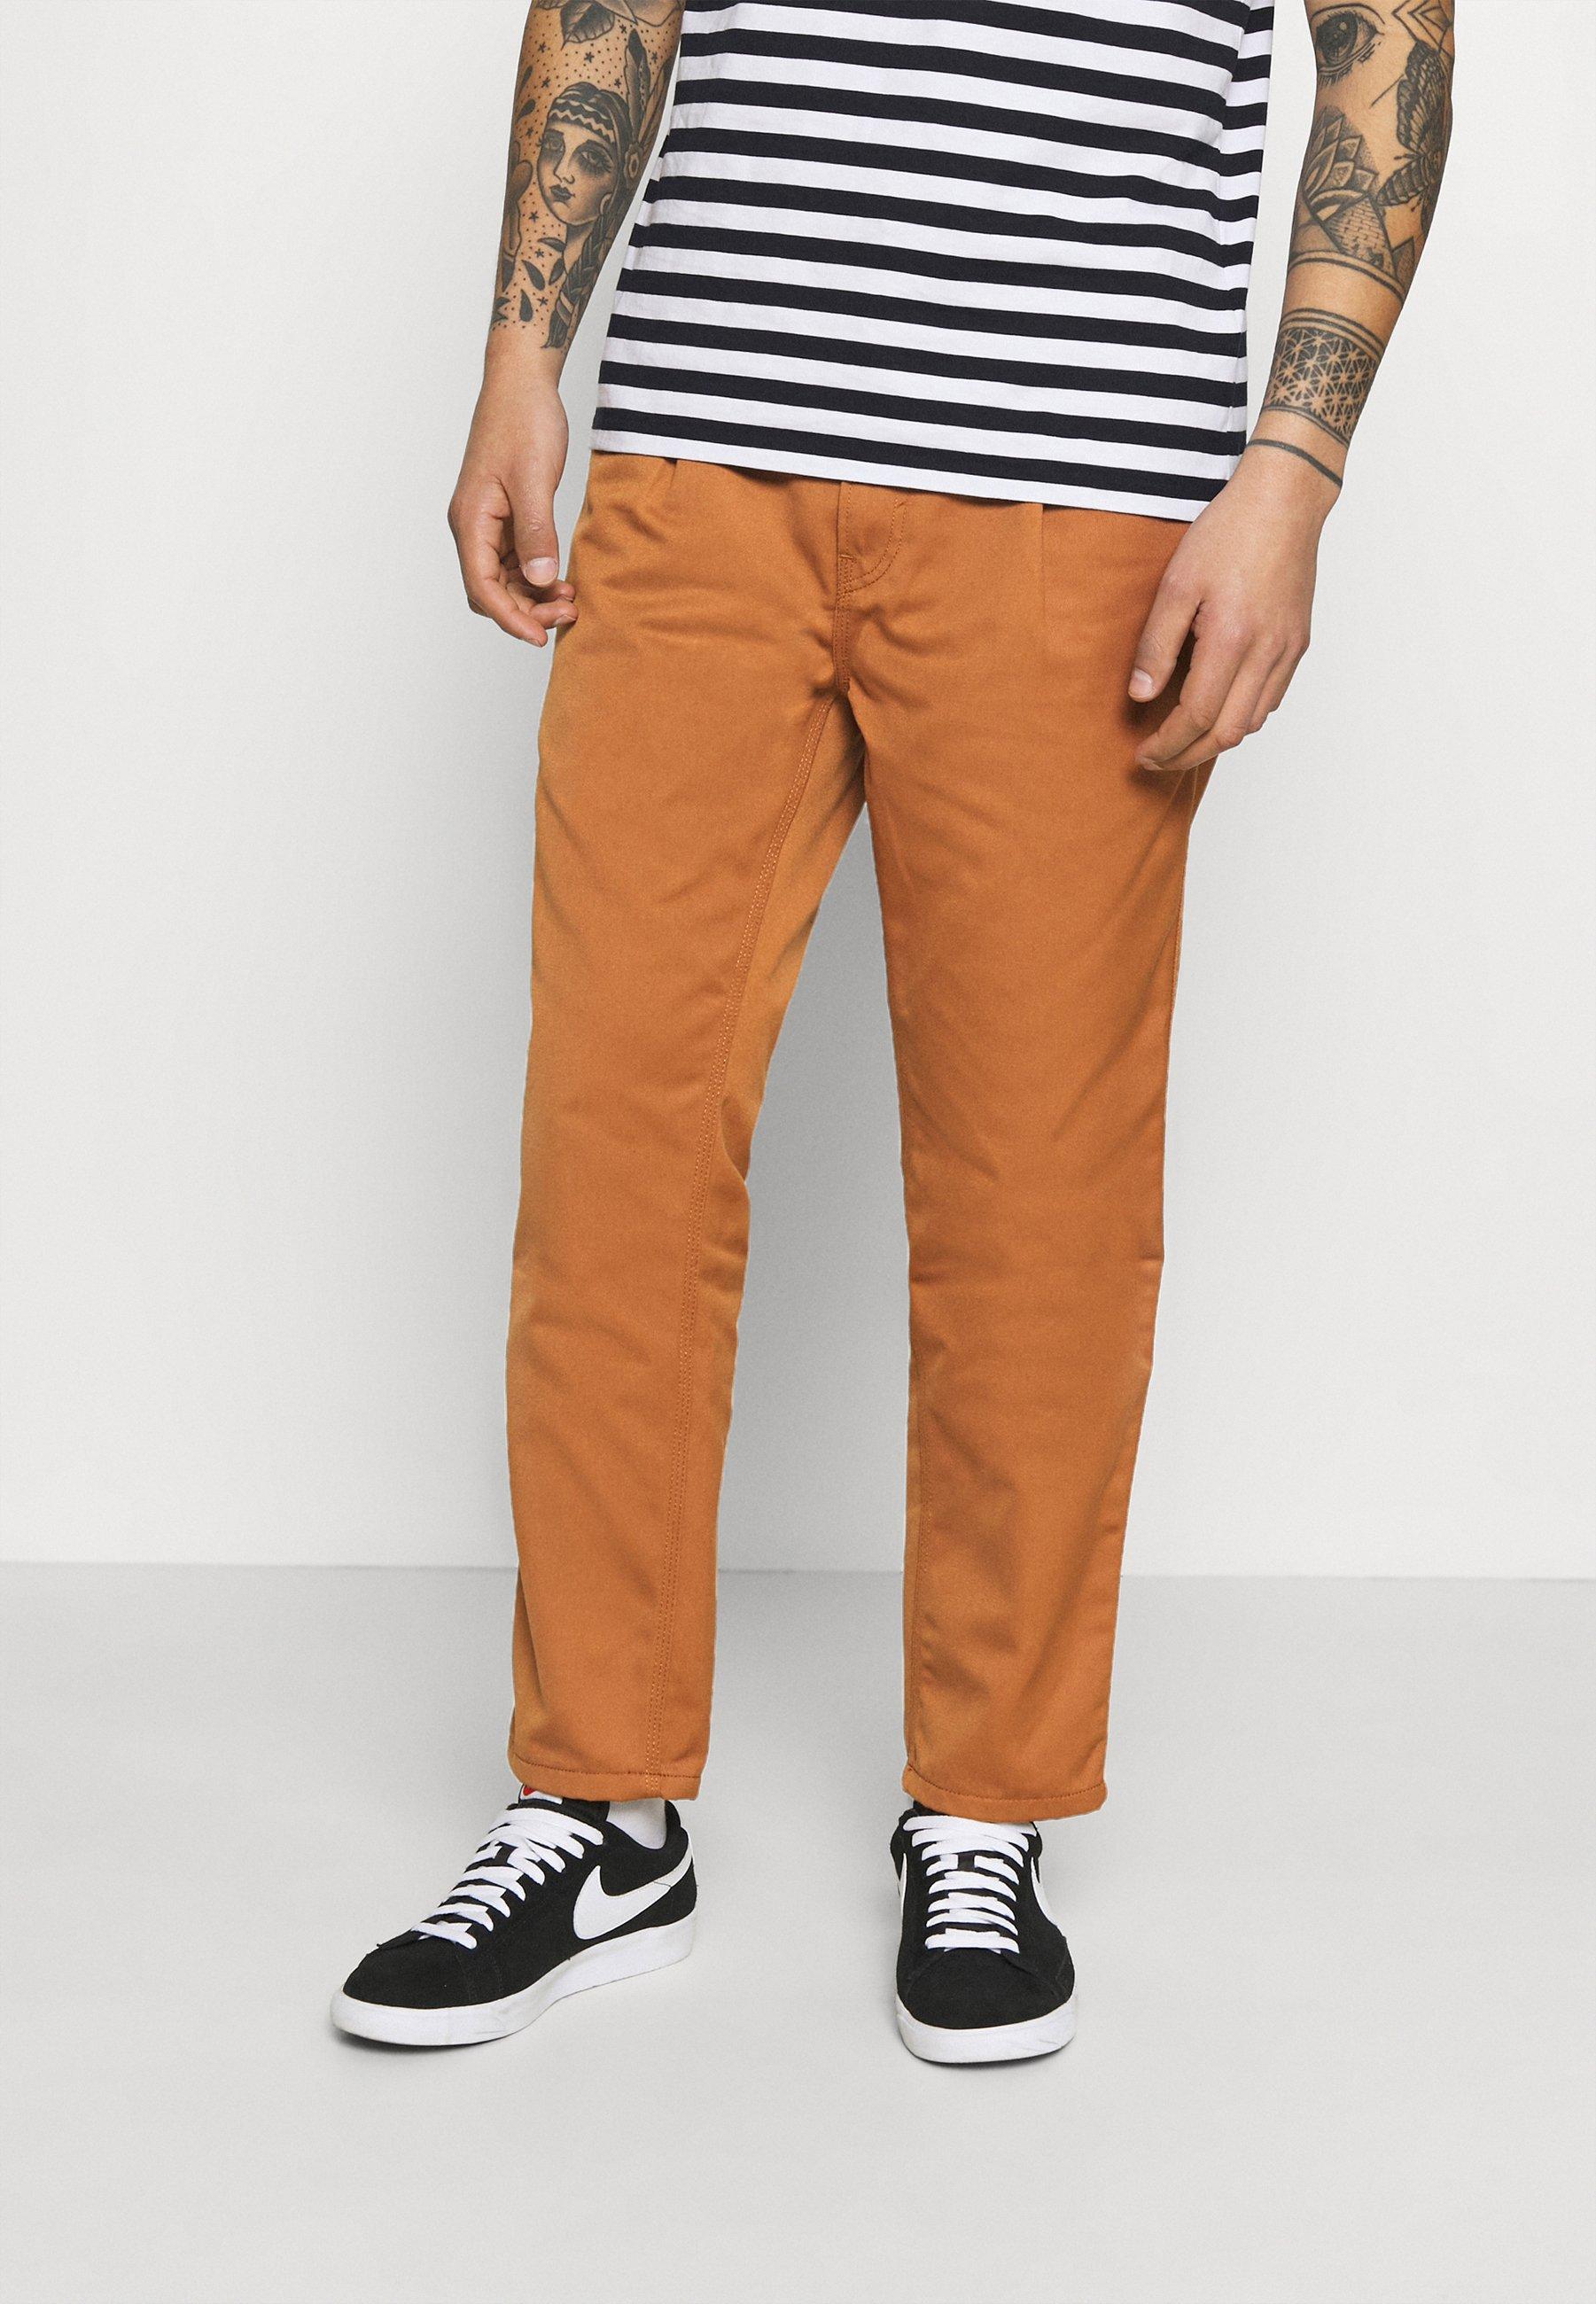 Men ABBOTT PANT DENISON - Trousers